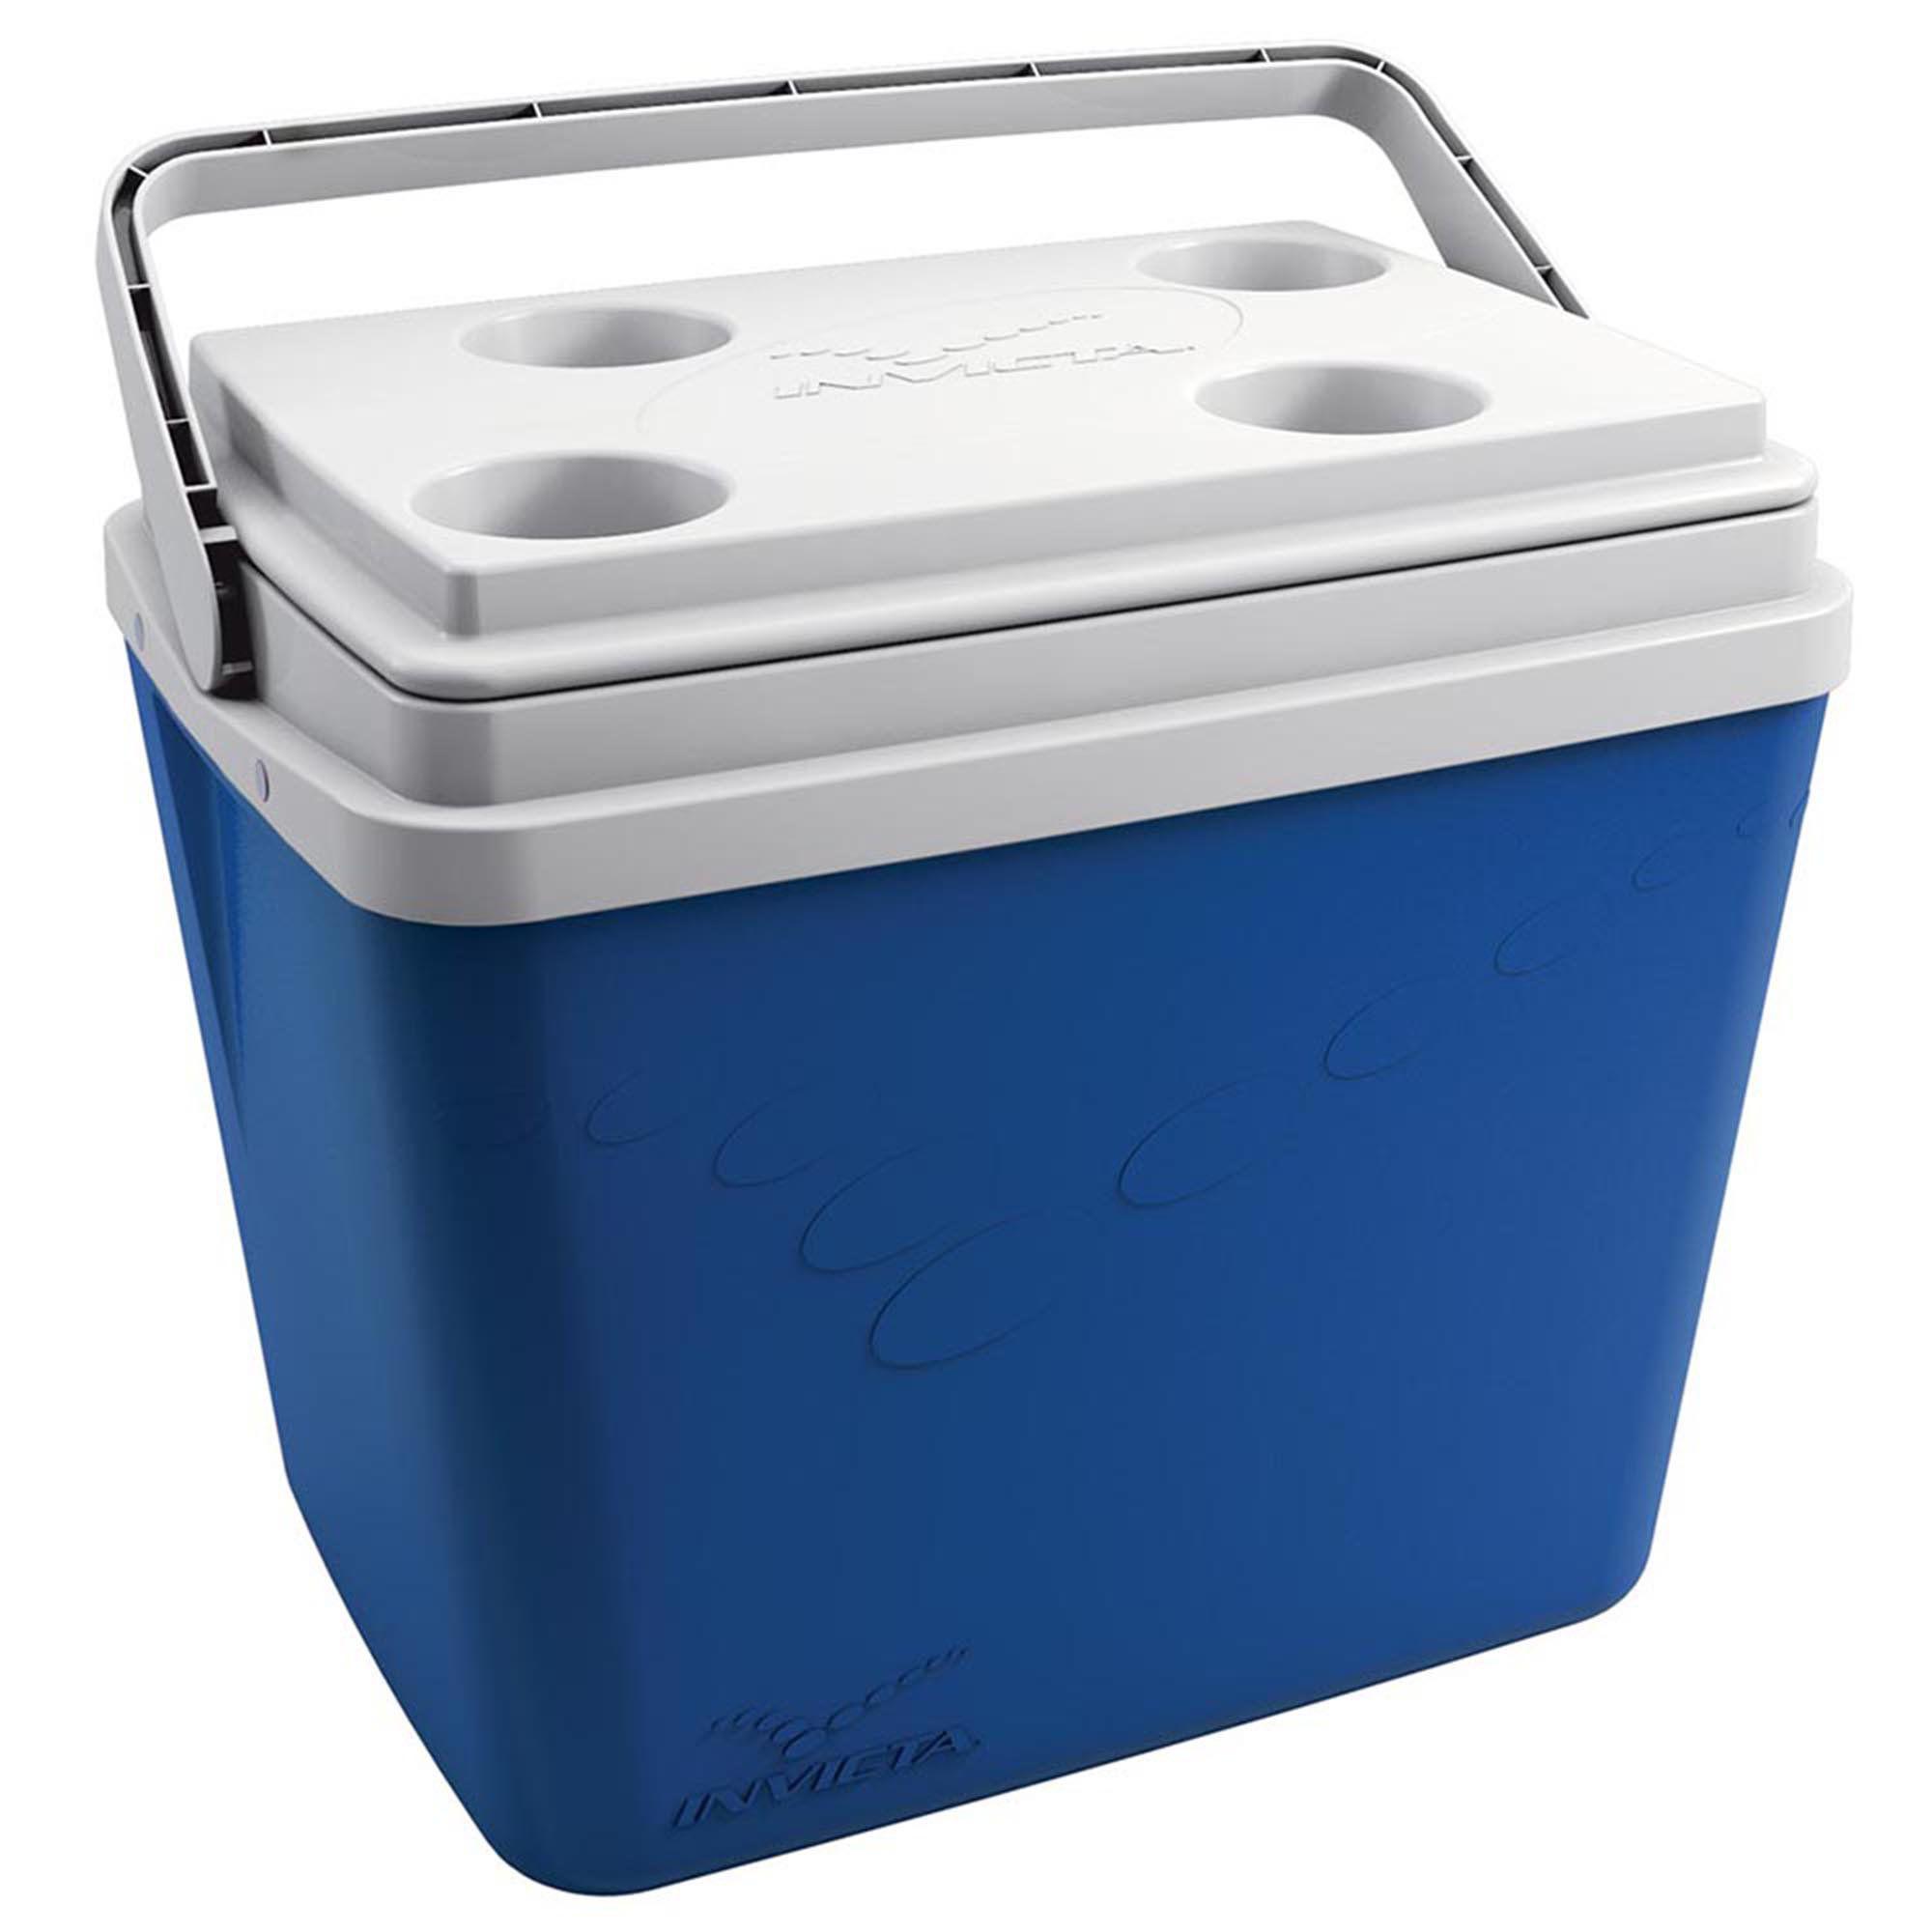 Caixa Termica Plastica 34 Litros Invicta